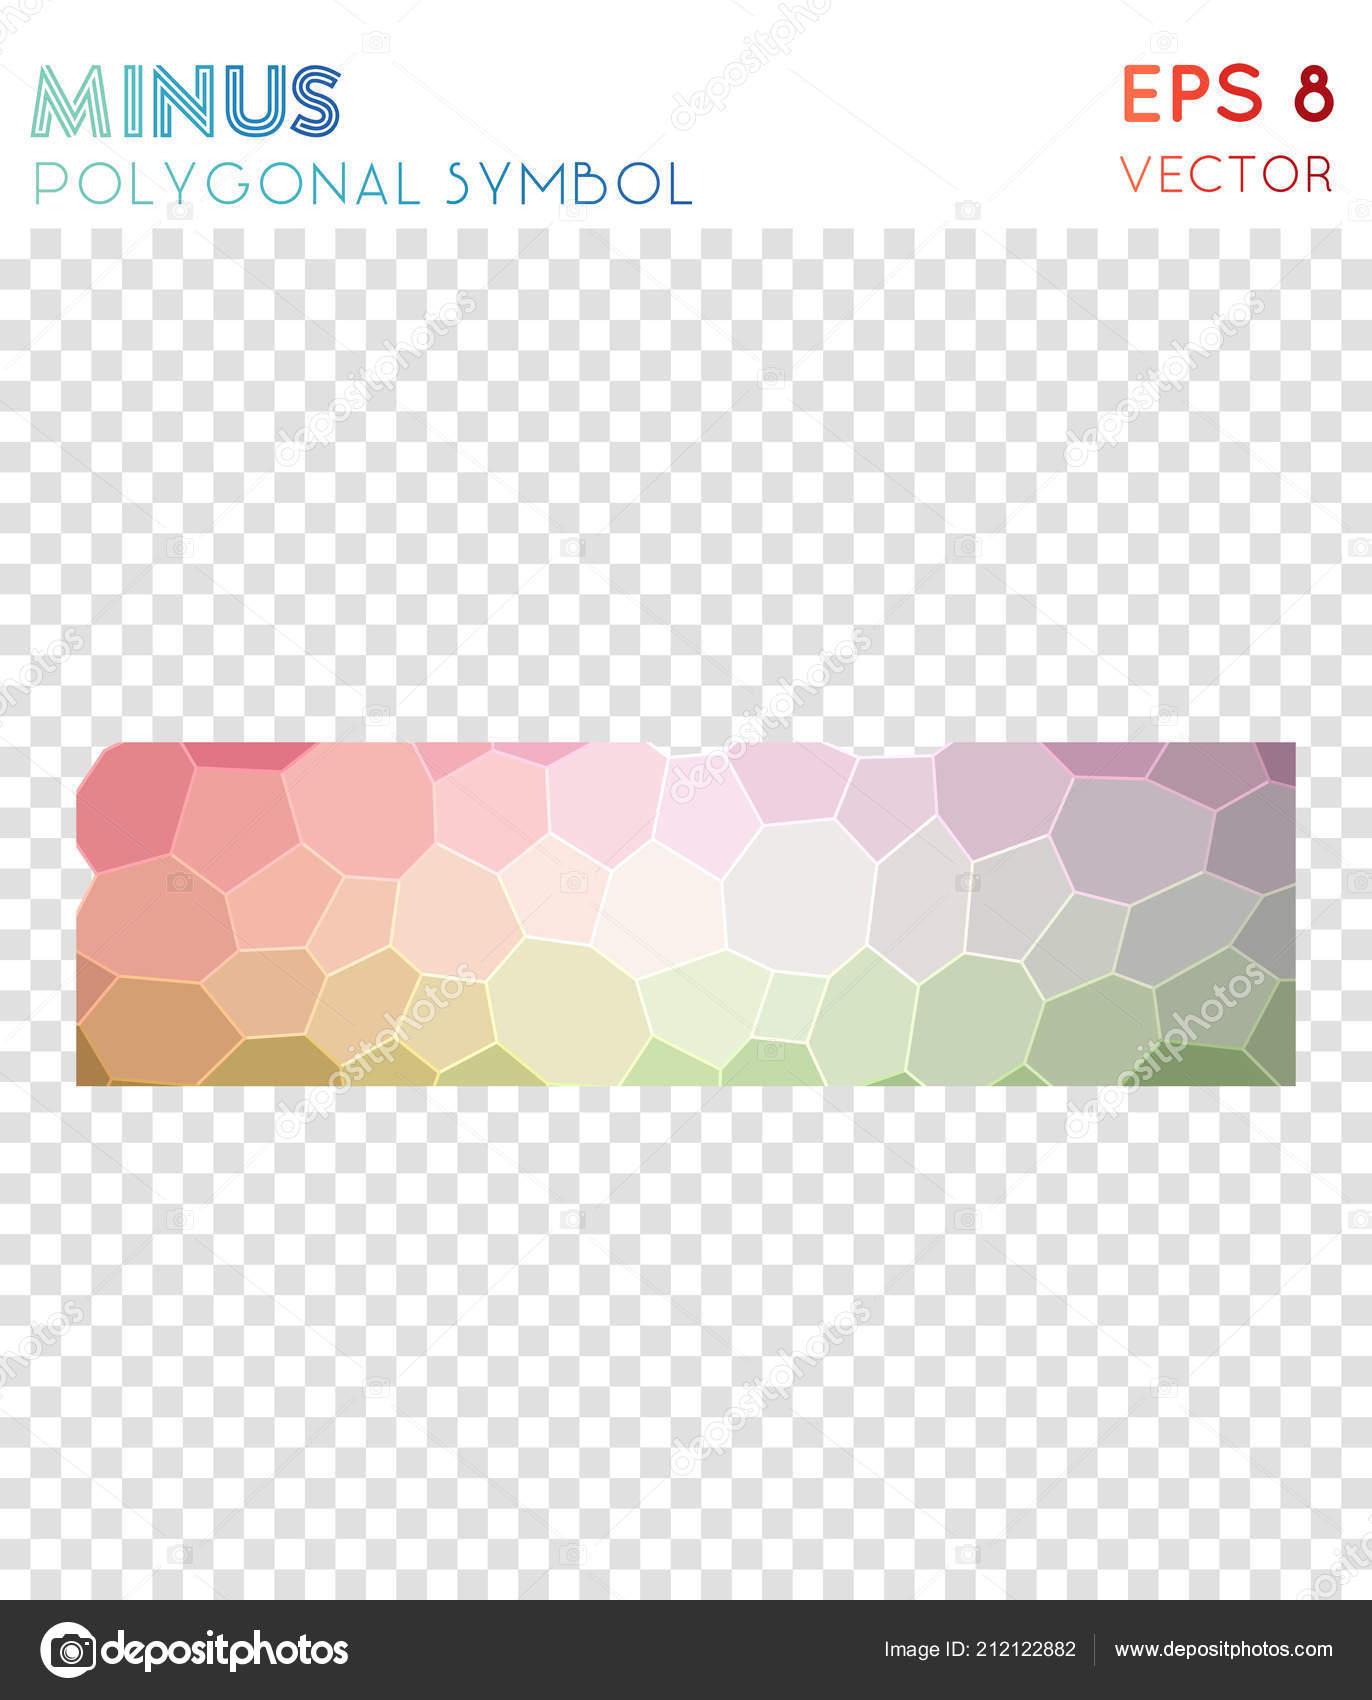 Minus Polygonal Symbol Astonishing Mosaic Style Symbol Vibrant Low Poly  Style Modern Design U2014 Vetores De